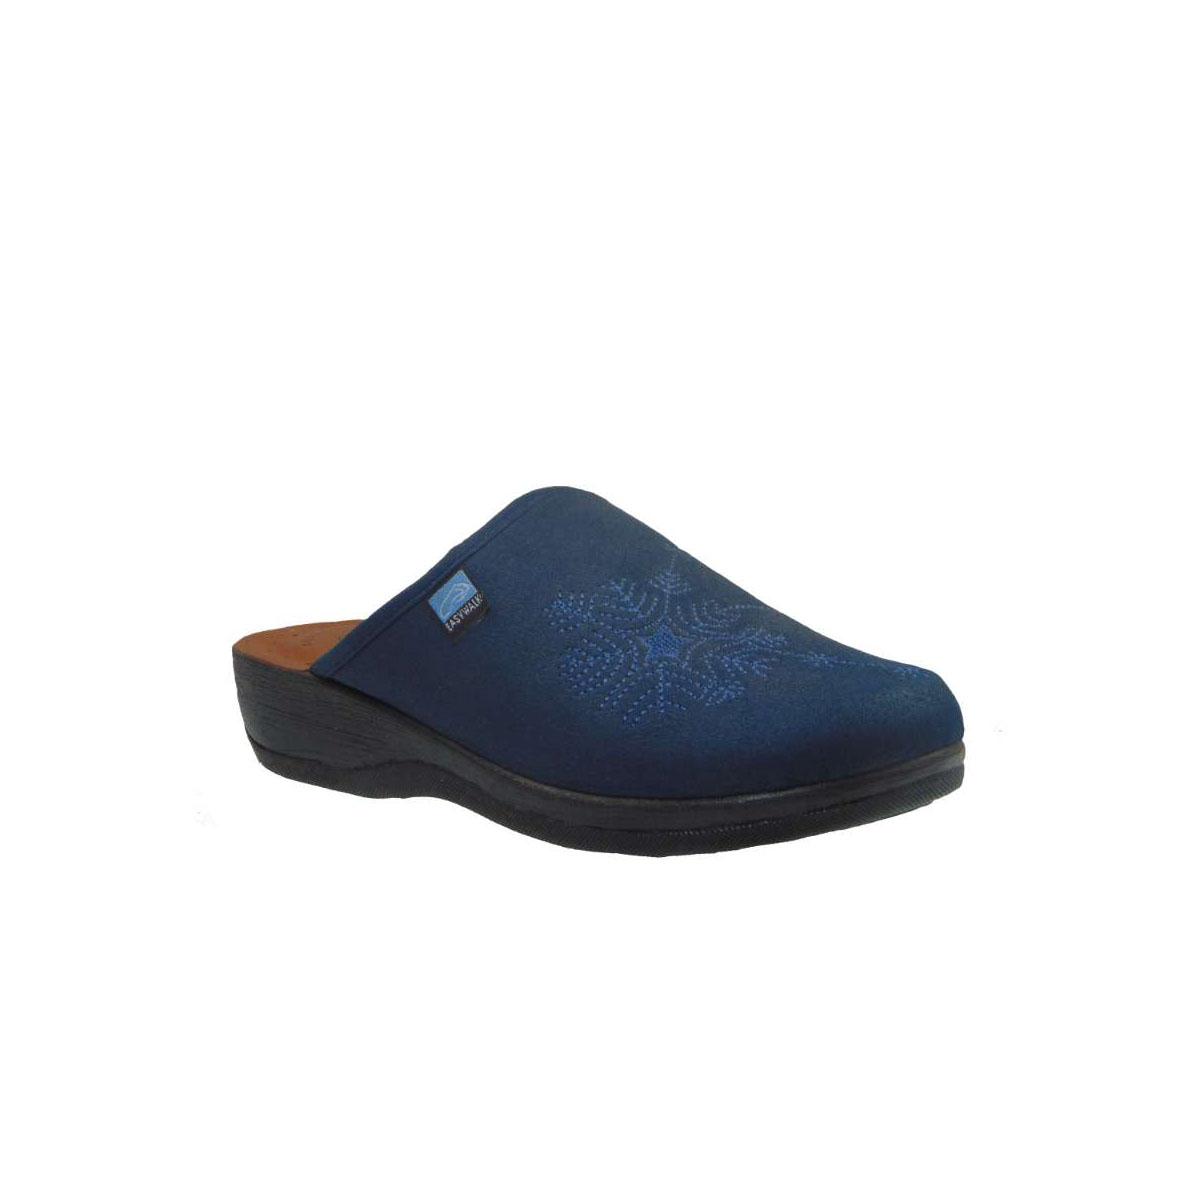 1fe19b6ba99 -42% Tsimpolis Easy Walk 37030 Ανατομική Παντόφλα Σπιτιού Μπλε